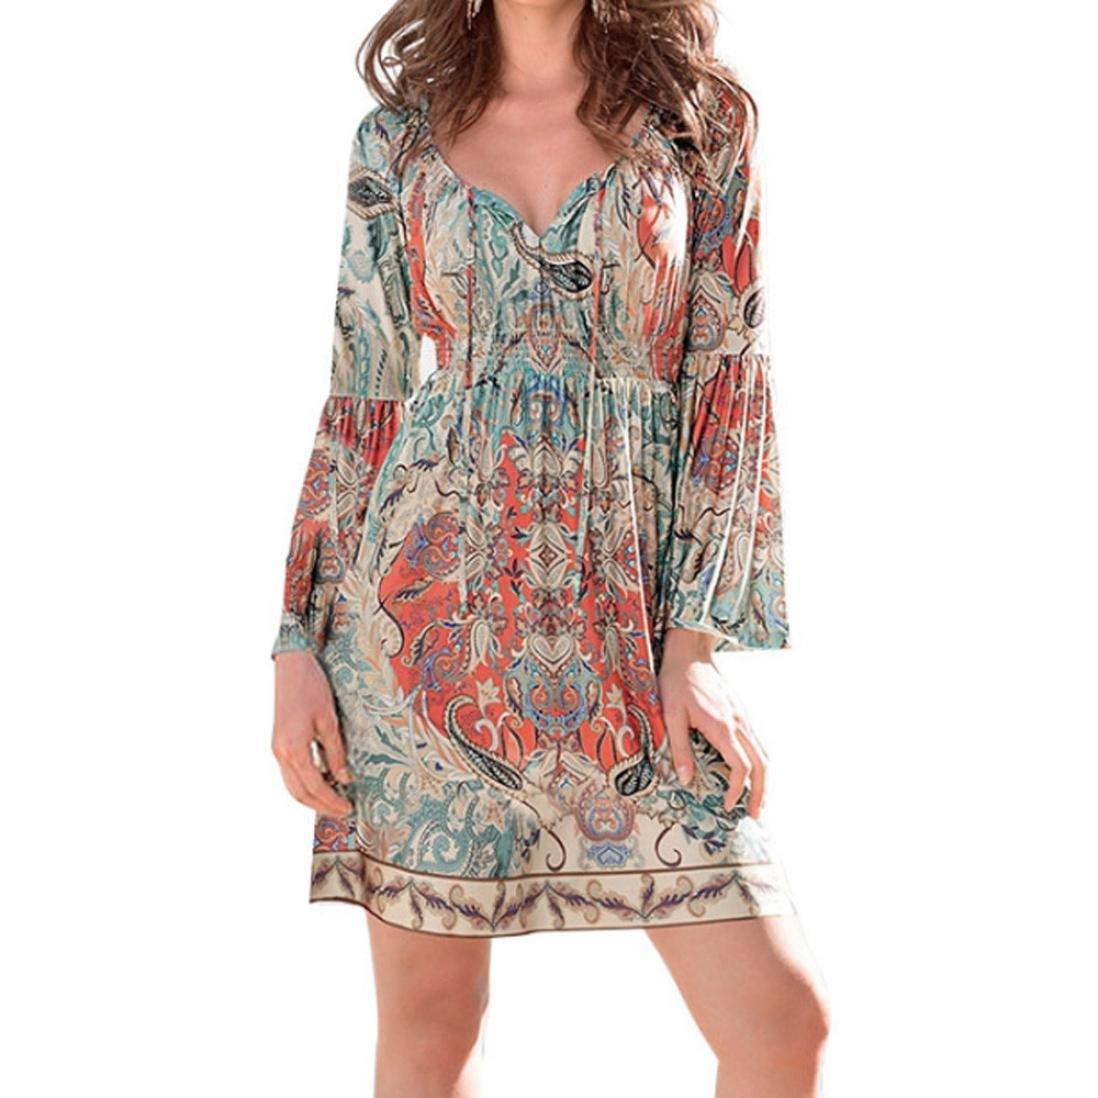 44b9d5b671dc Amazon.com  Hot Sale!!! Women Summer Bohemian Beach Dress